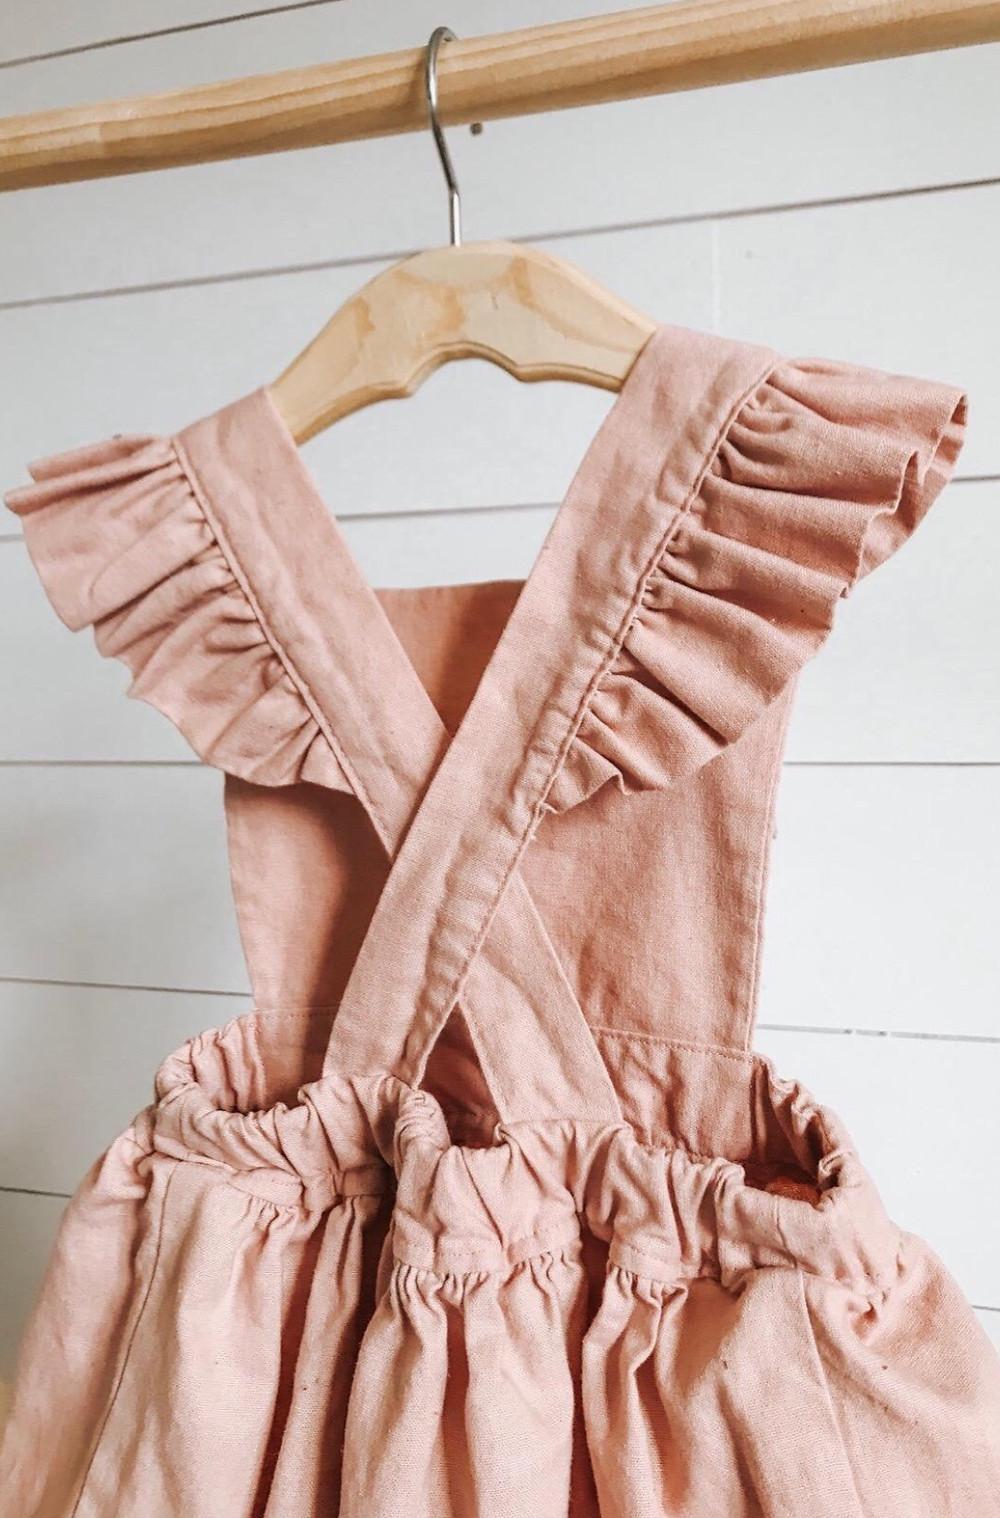 Talia & Co beautiful handmade linen babies and kids dresses & clothing